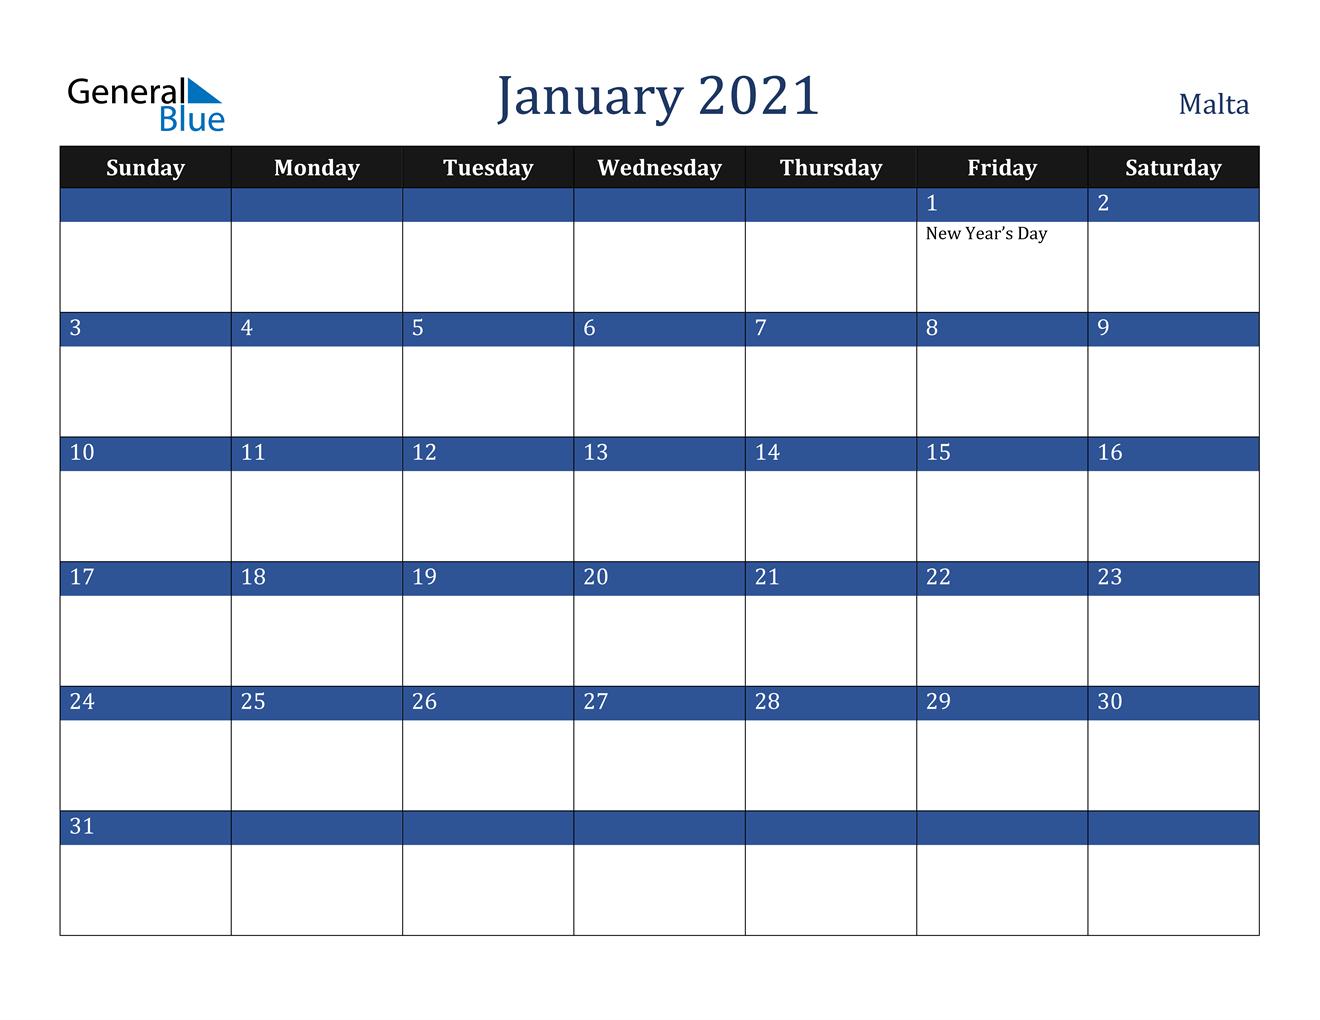 January 2021 Calendar Malta